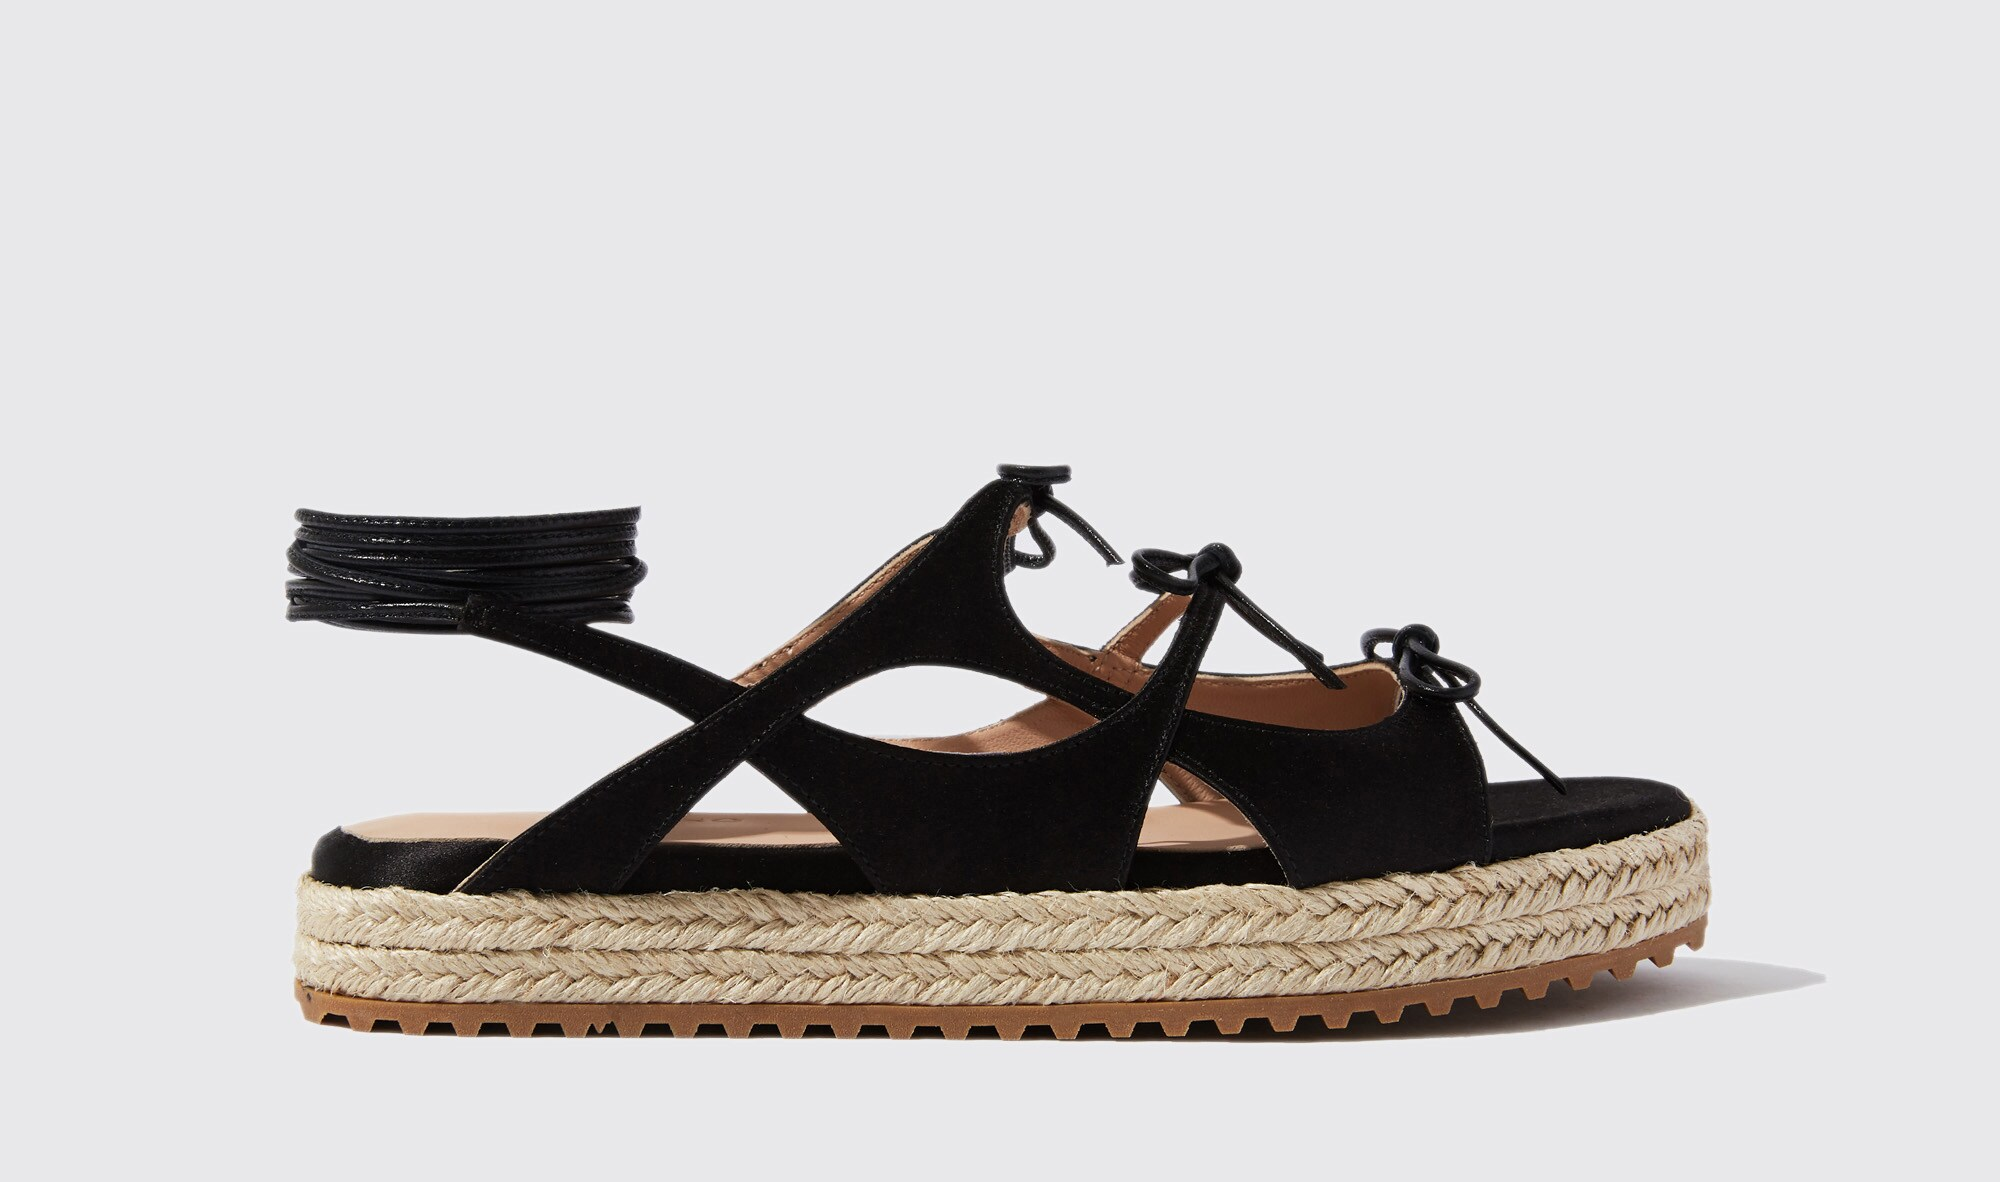 Sandalo in camoscio con fondo in corda, SCAROSSO BY PAULA CADEMARTORI (245 €).